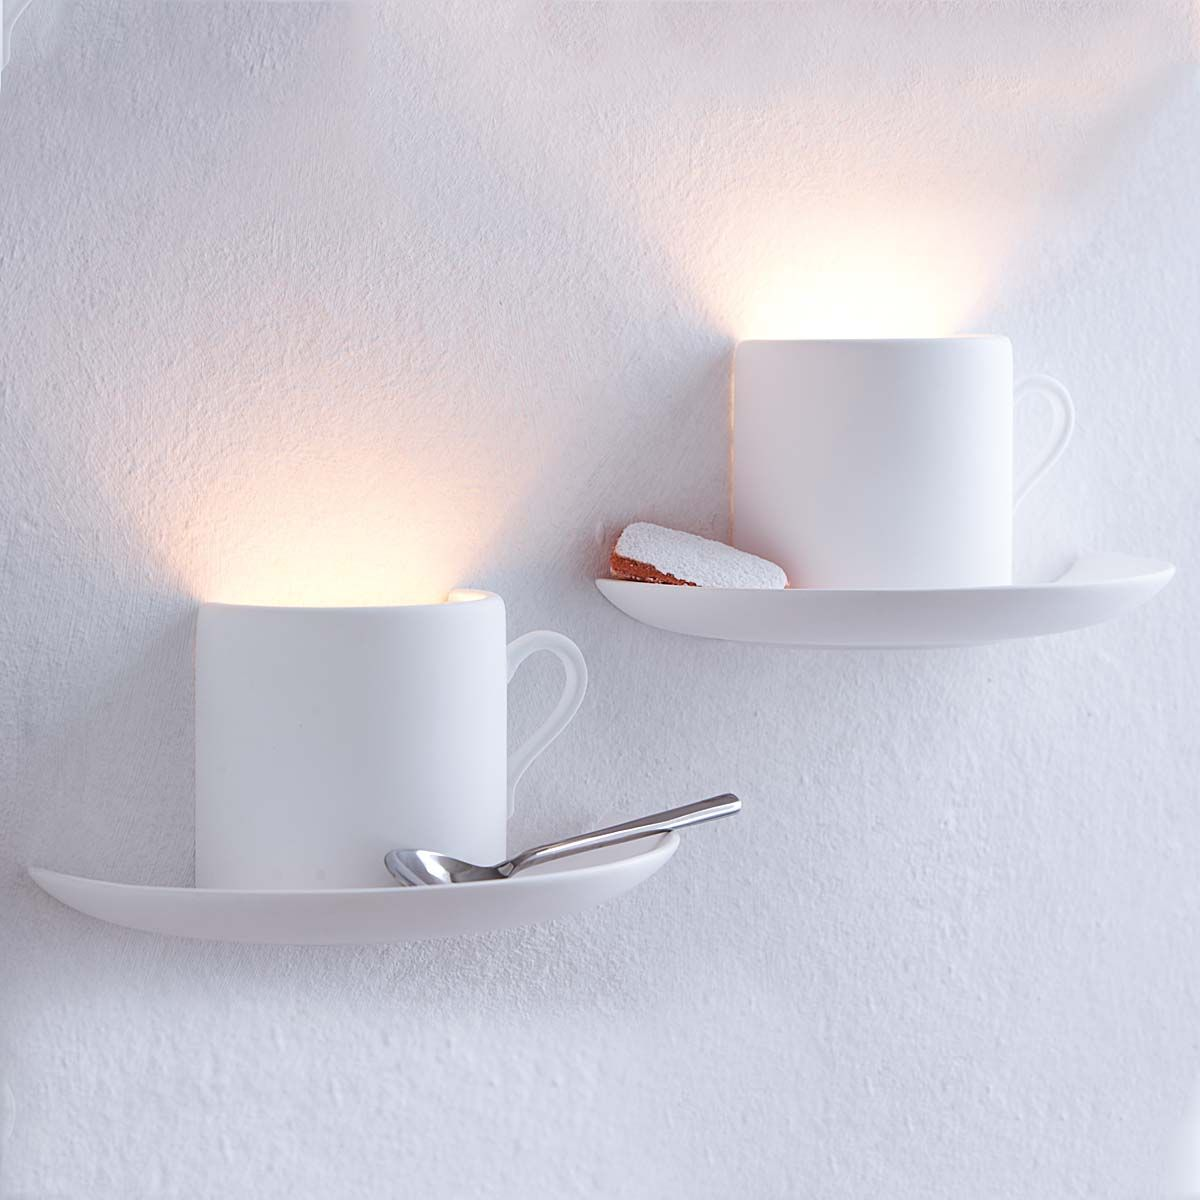 coffee cup lighting | Modern iç dekorasyon, Dekor ve